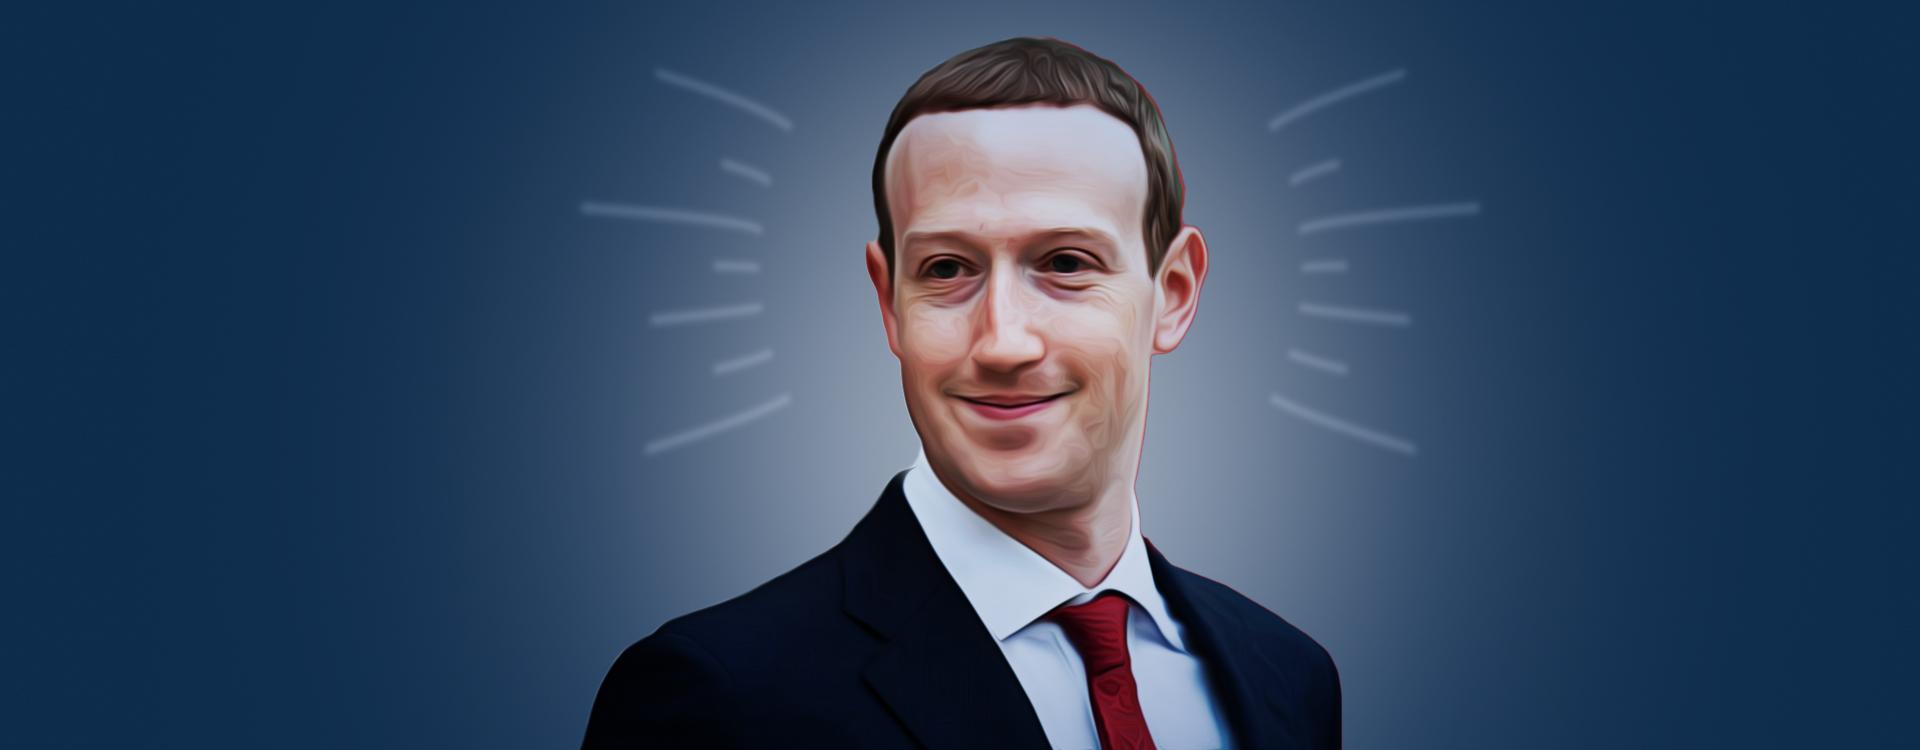 Mark Zuckerberg on Entrepreneurial Success